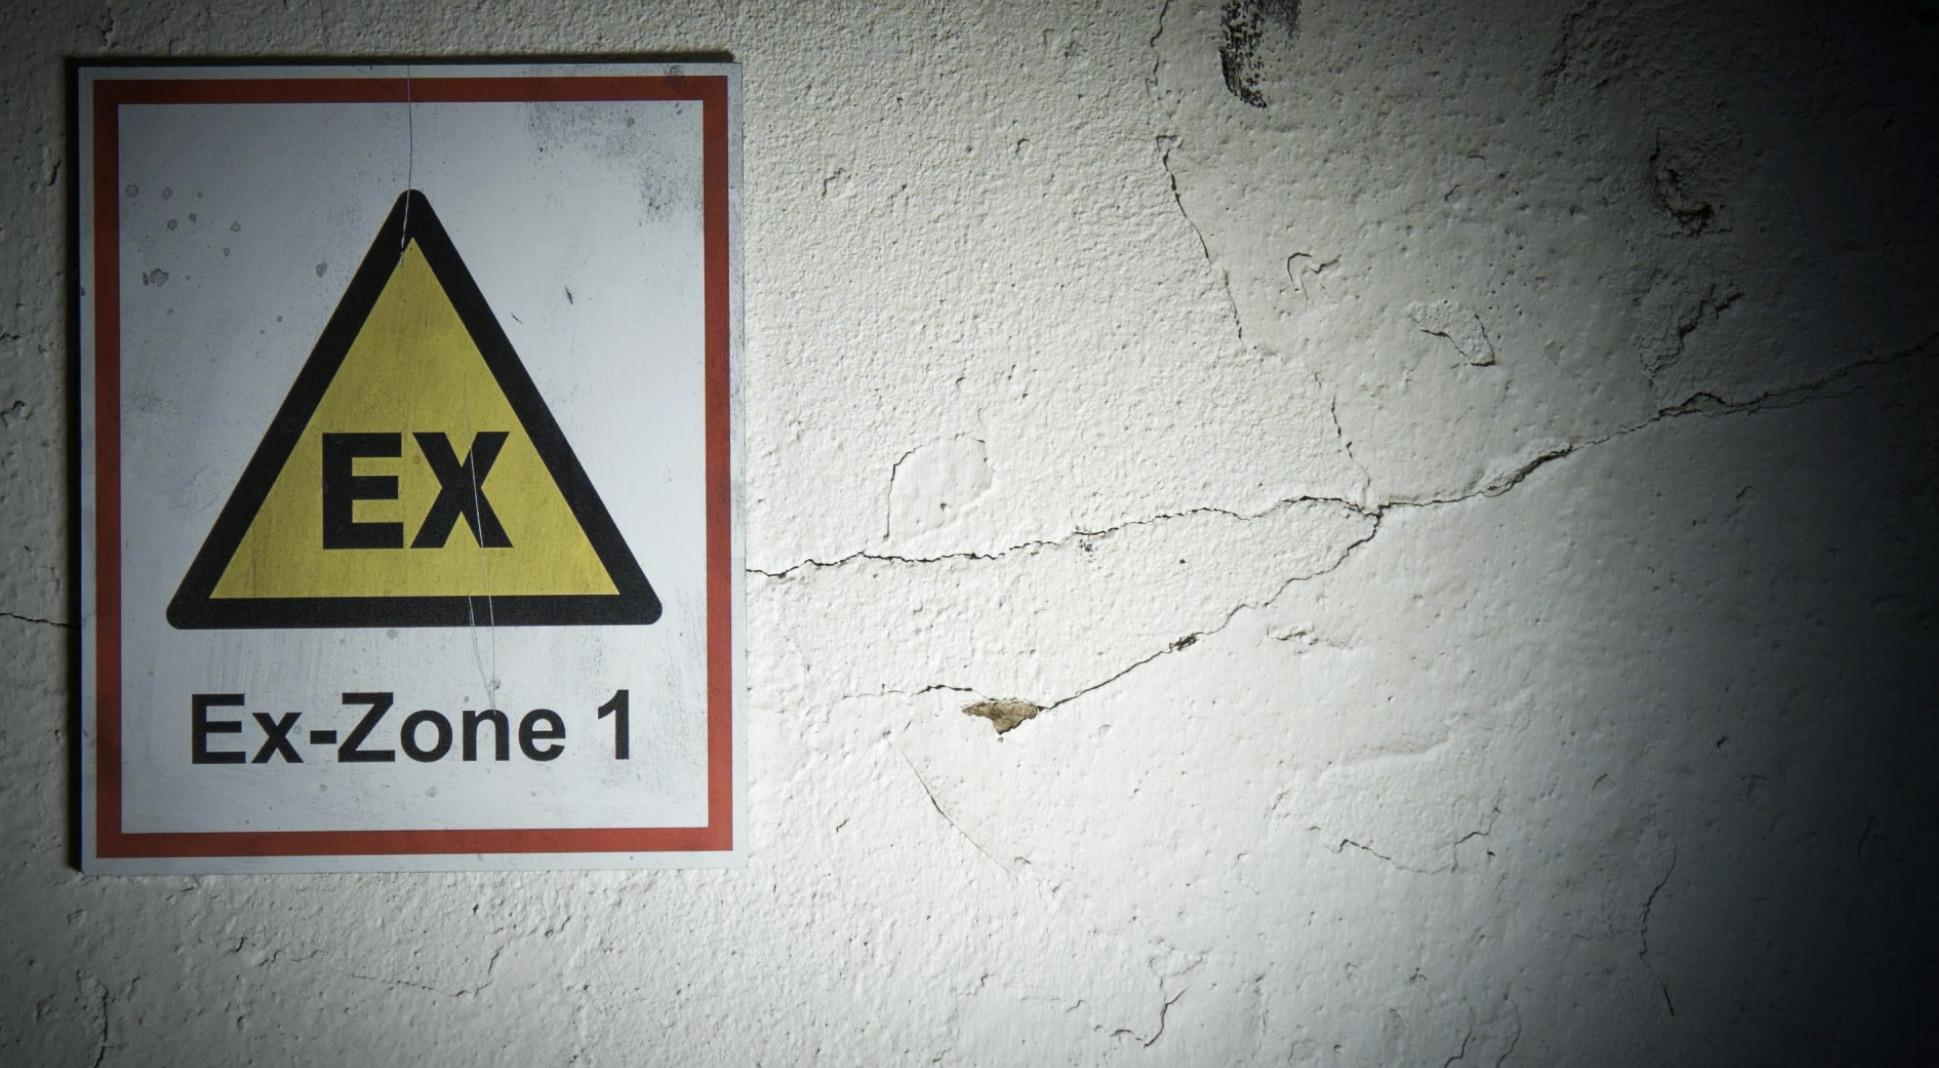 Atex Zone 1 sign.